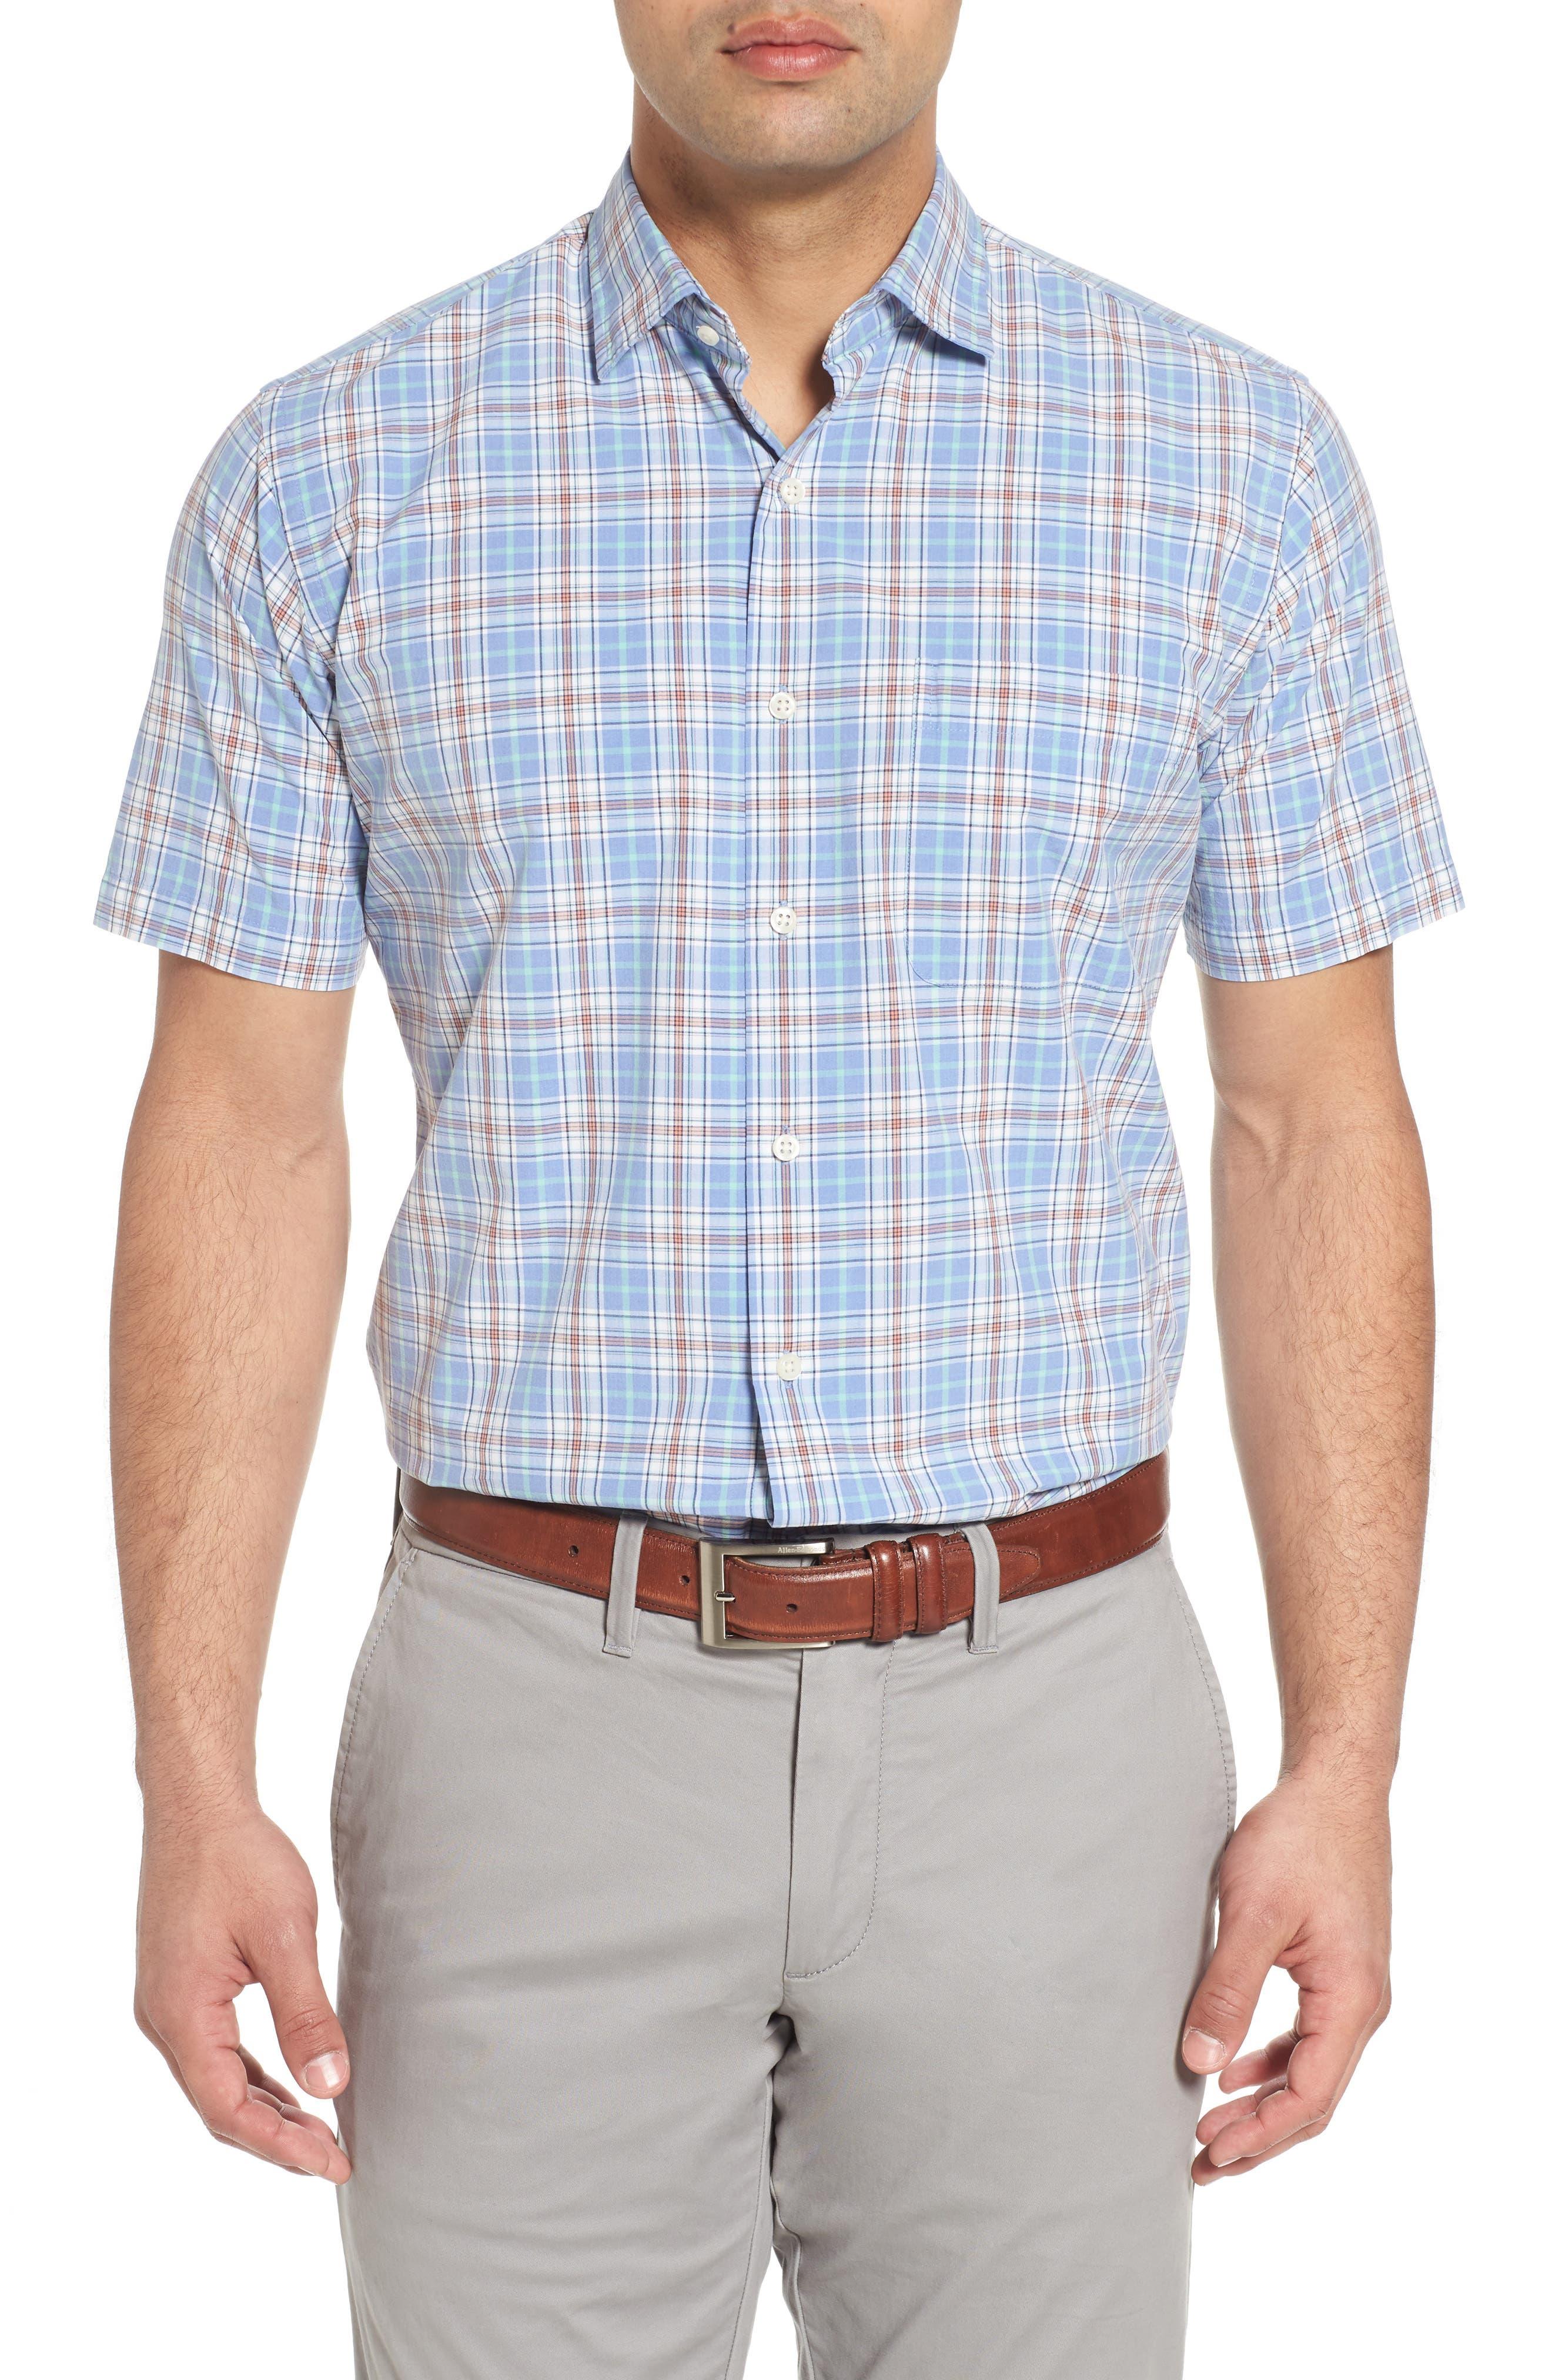 Rockport Plaid Sport Shirt,                         Main,                         color, 407